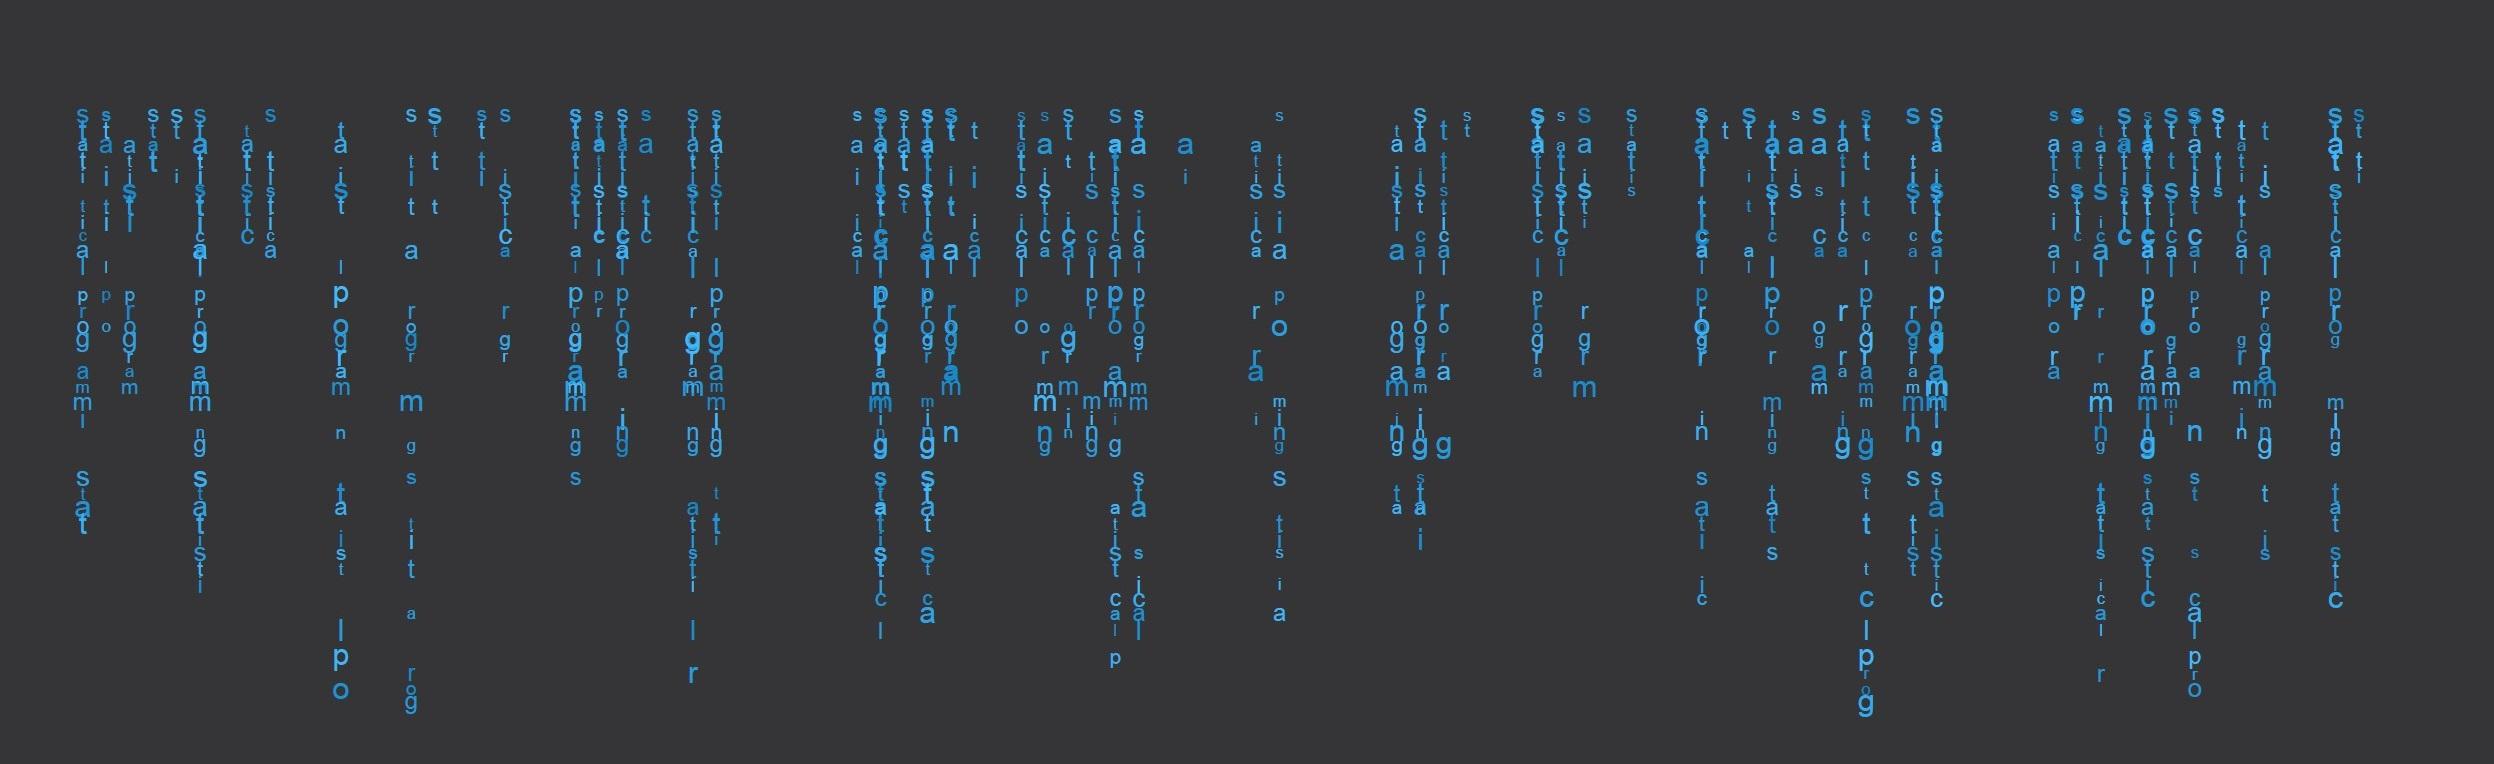 Missing Data Imputation Matrix